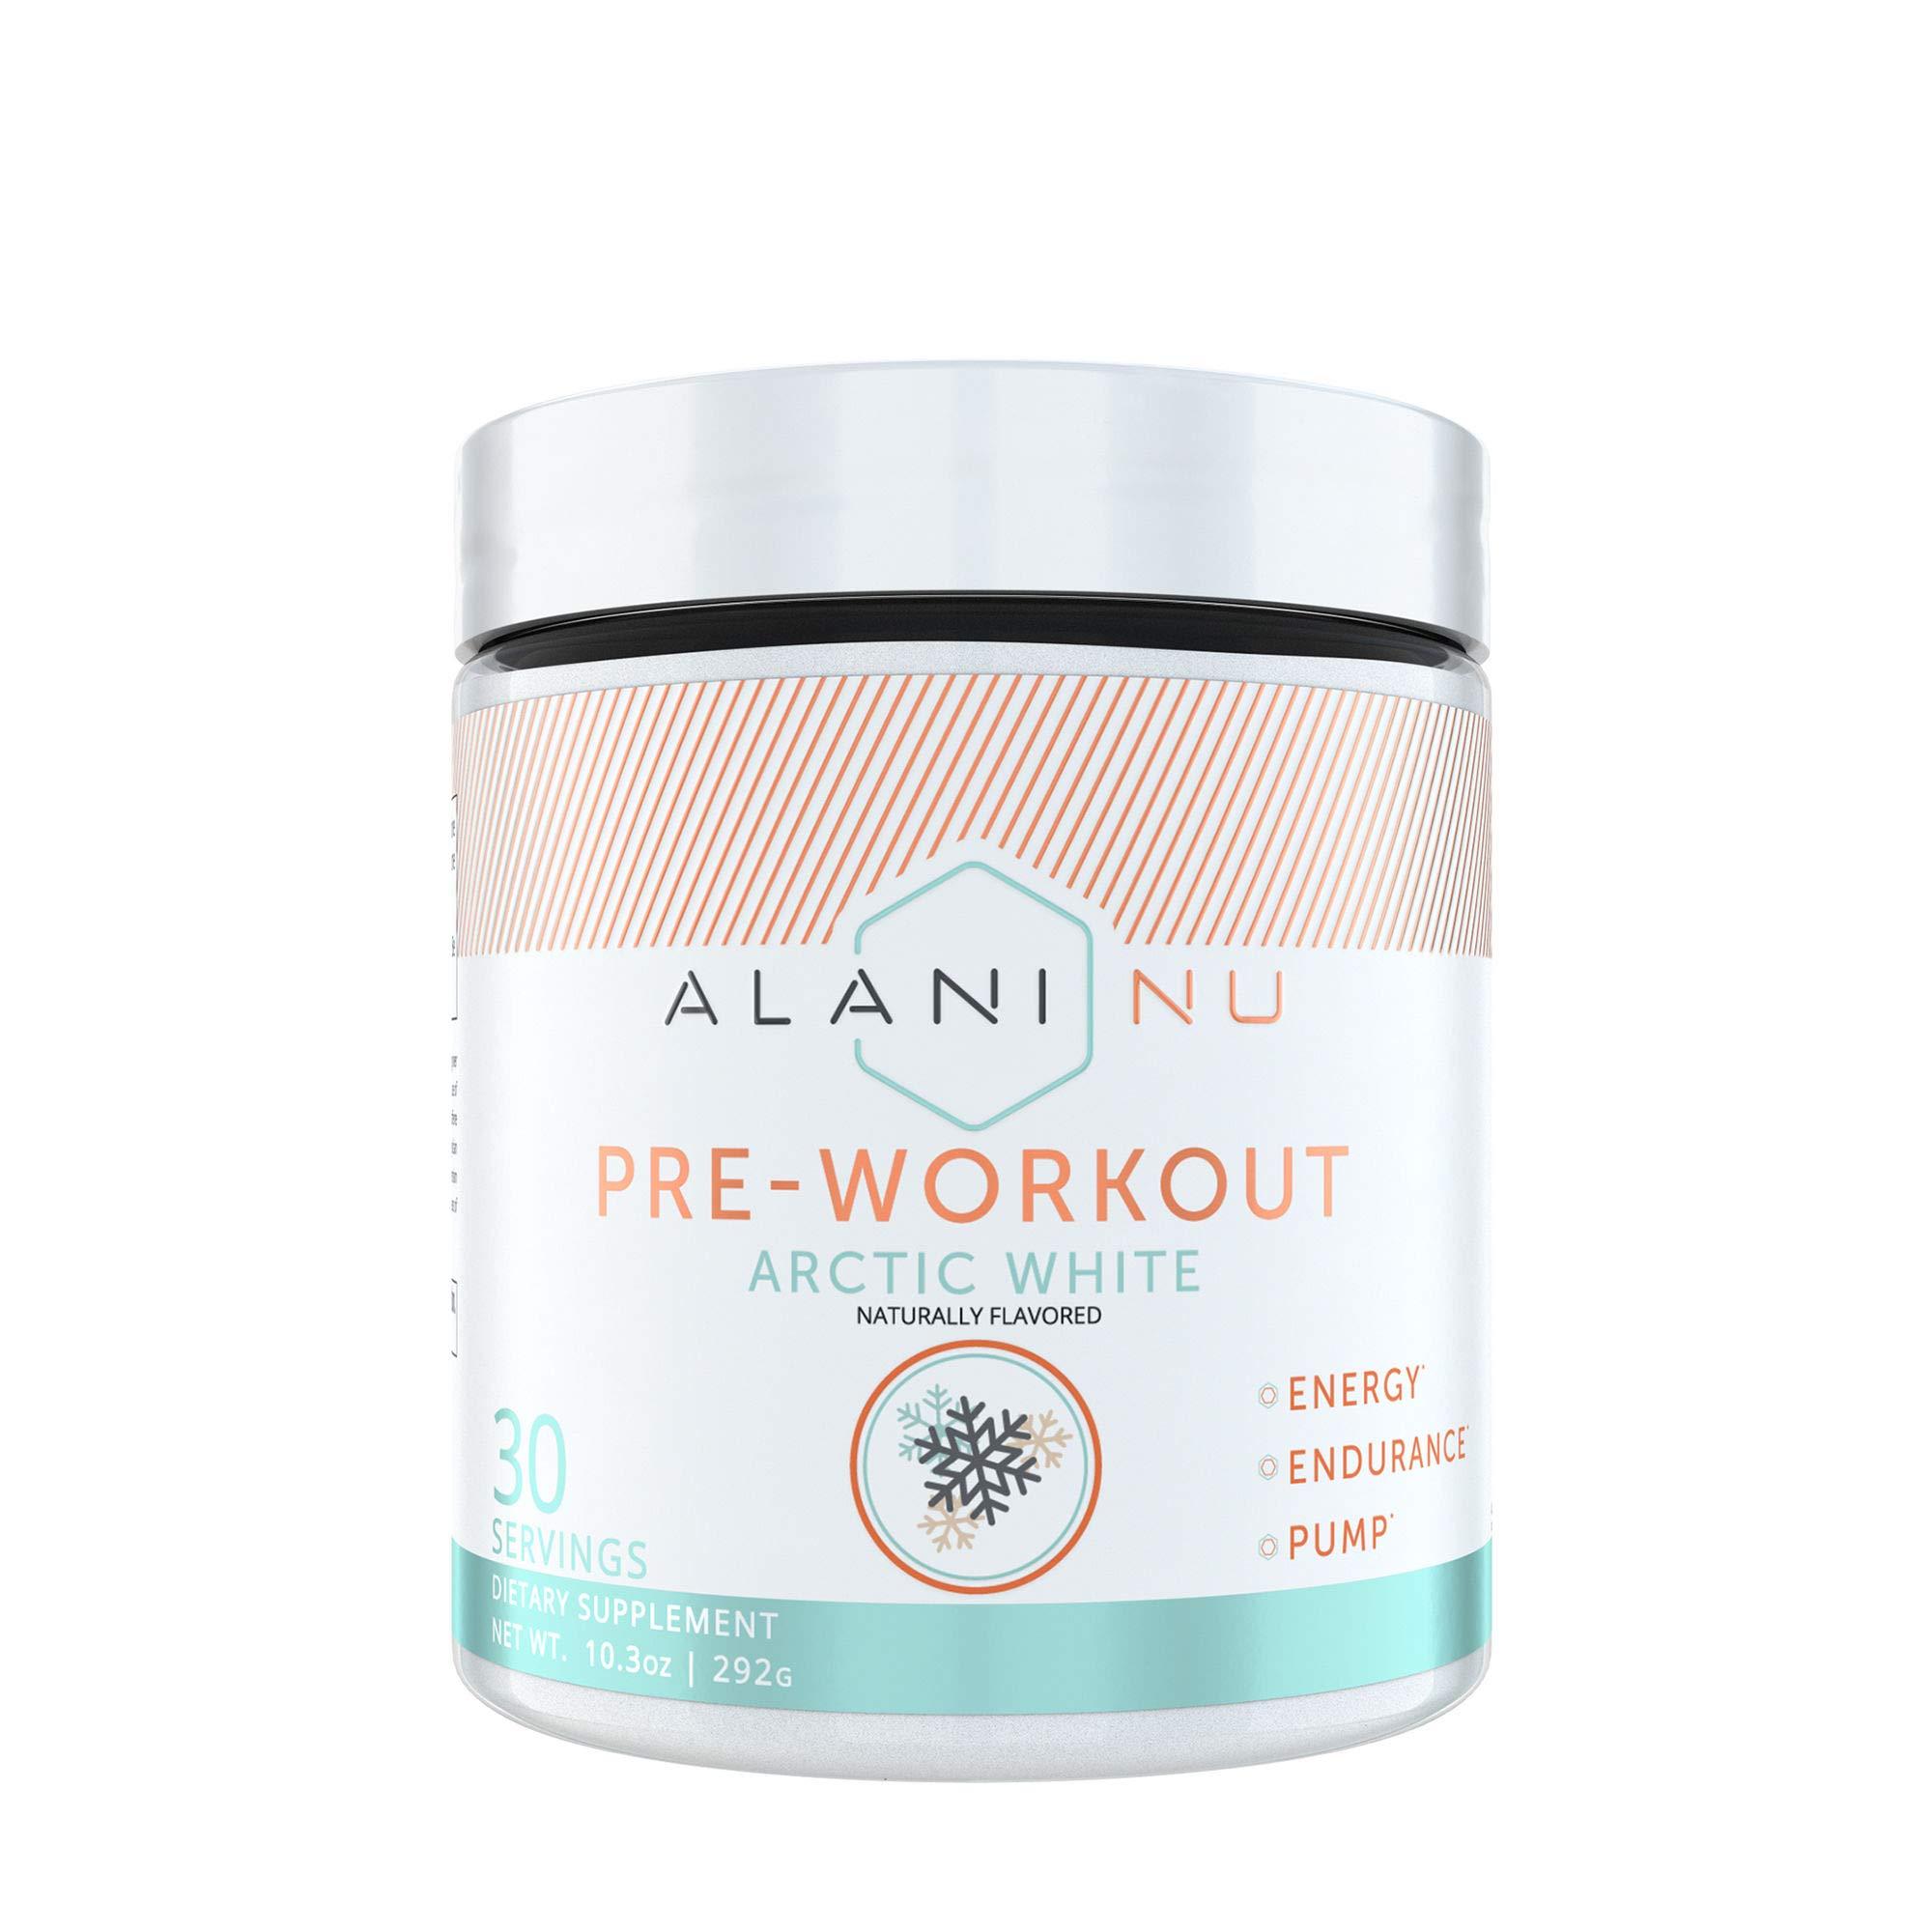 Alani Nu Pre-Workout - Arctic White by Alani Nu